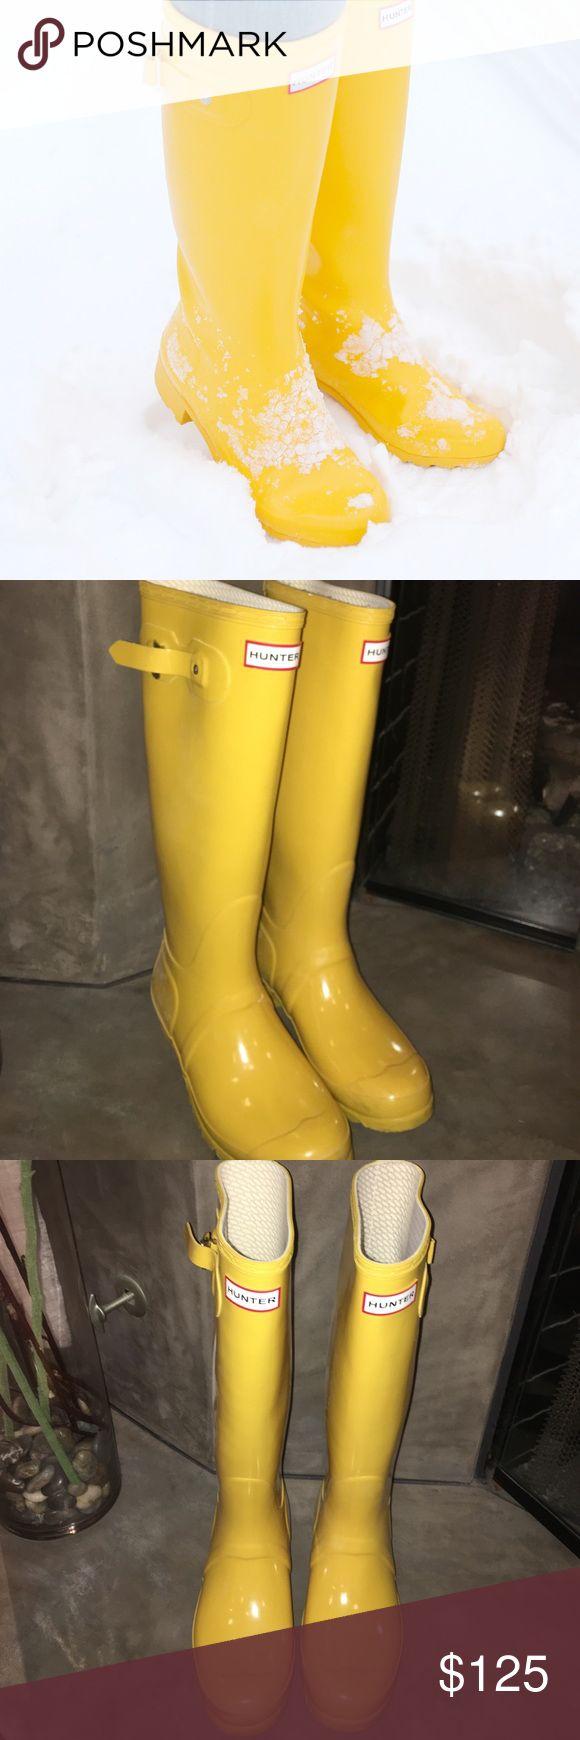 25  best ideas about Rain & Winter Boots on Pinterest | Women's ...